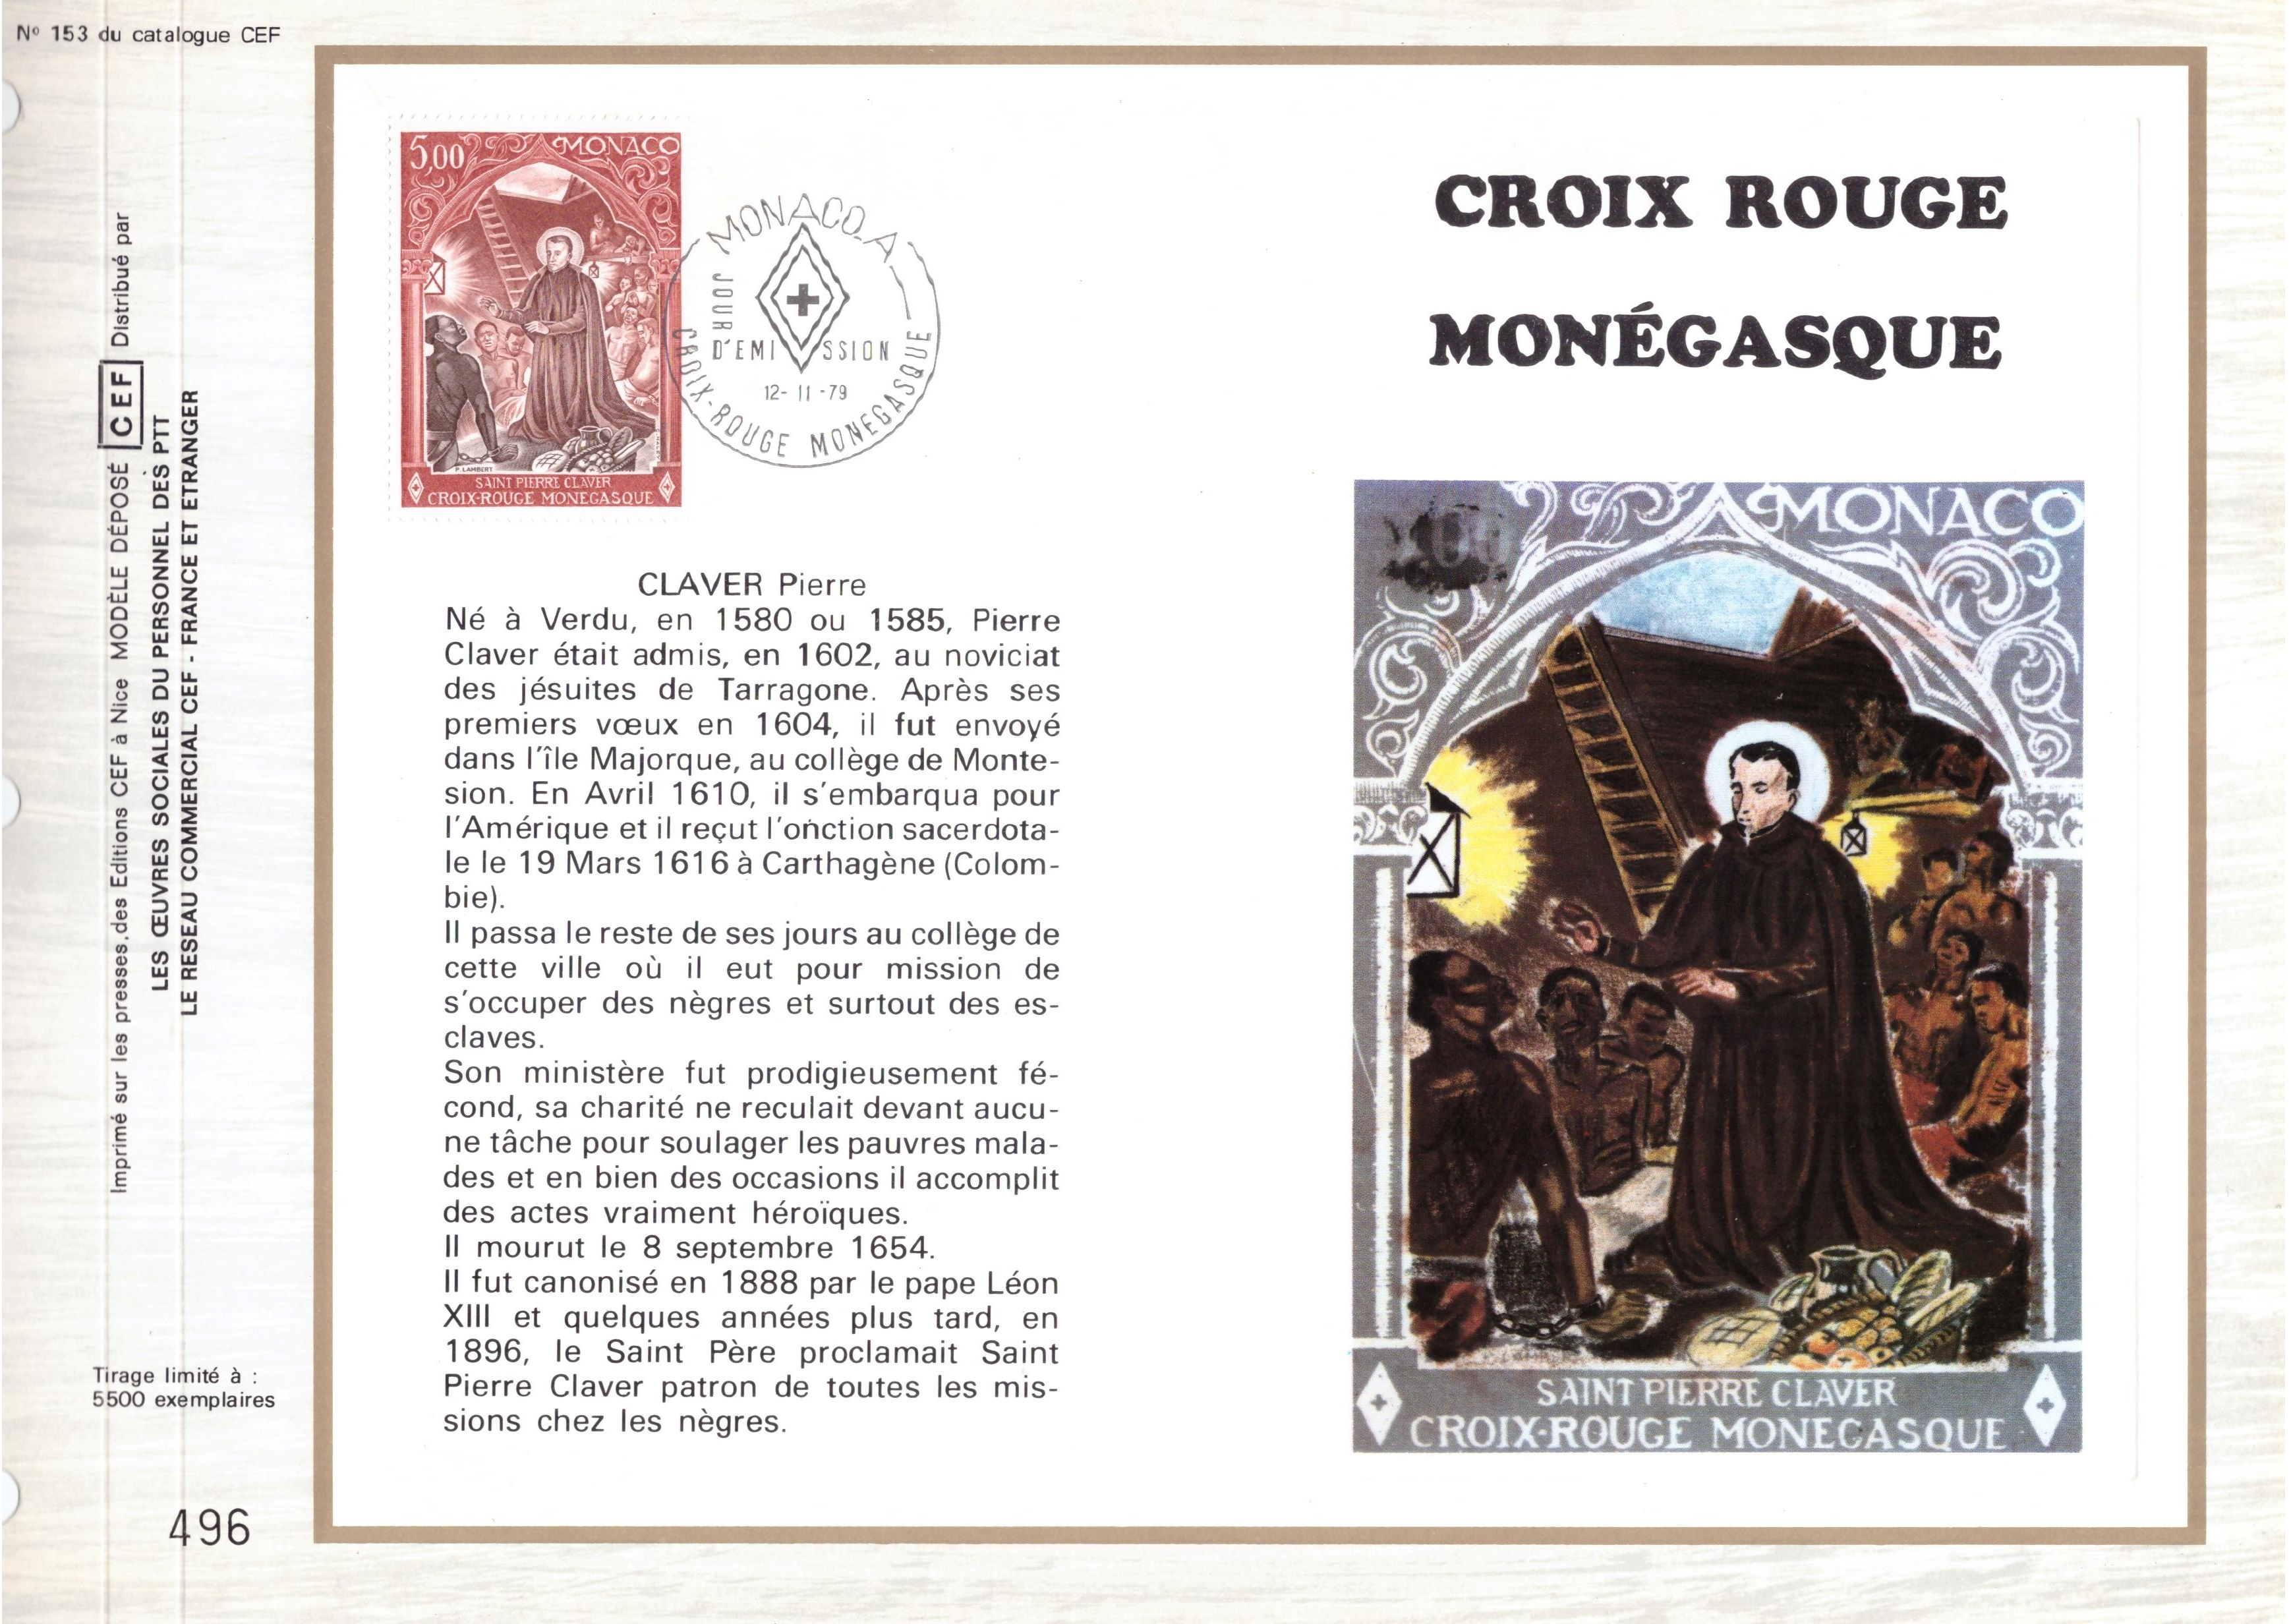 cef_croix_rouge_monaco_1979_1.jpg